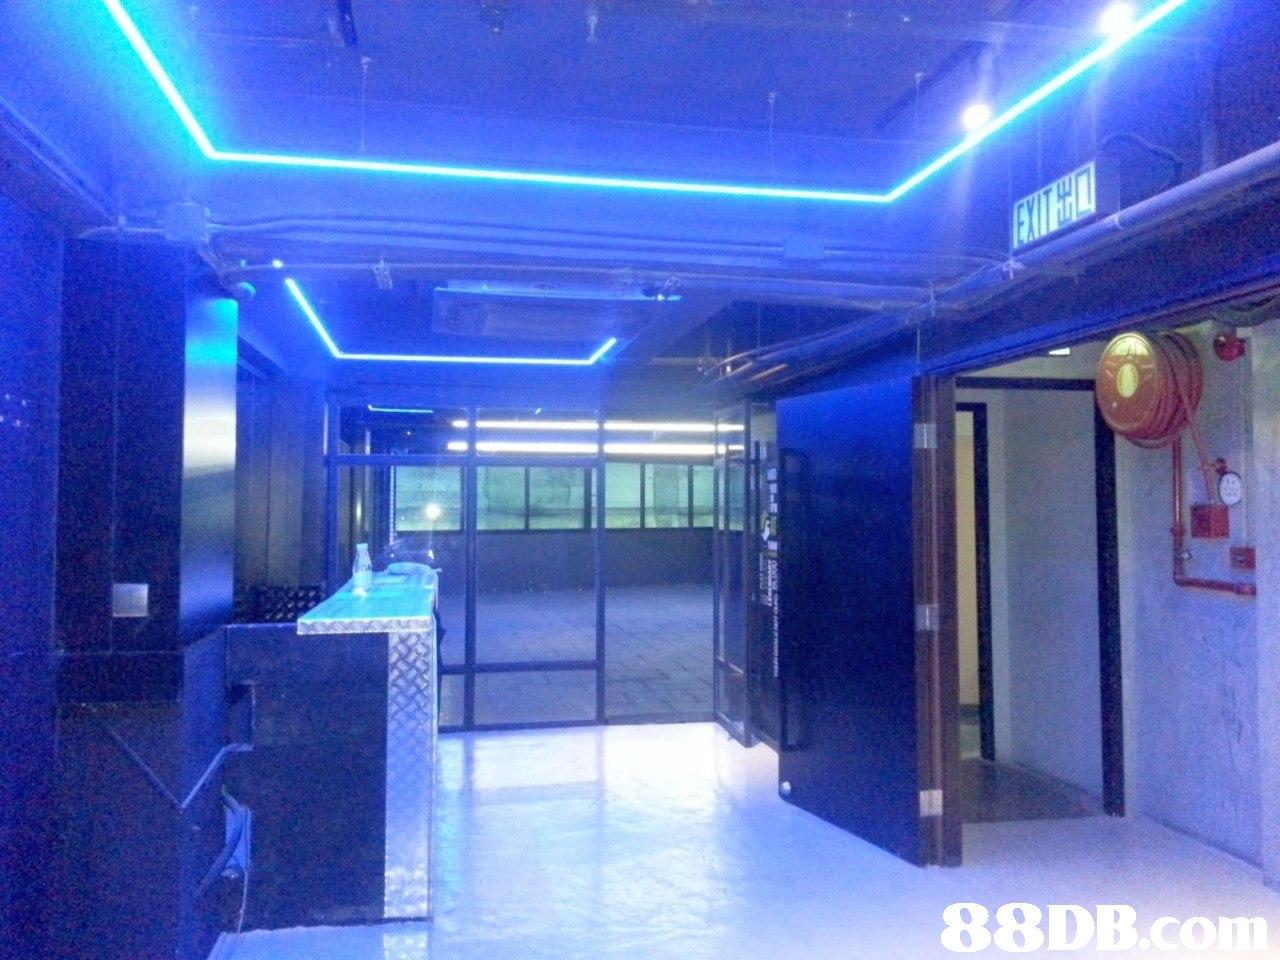 88DB  blue,property,light,lighting,ceiling